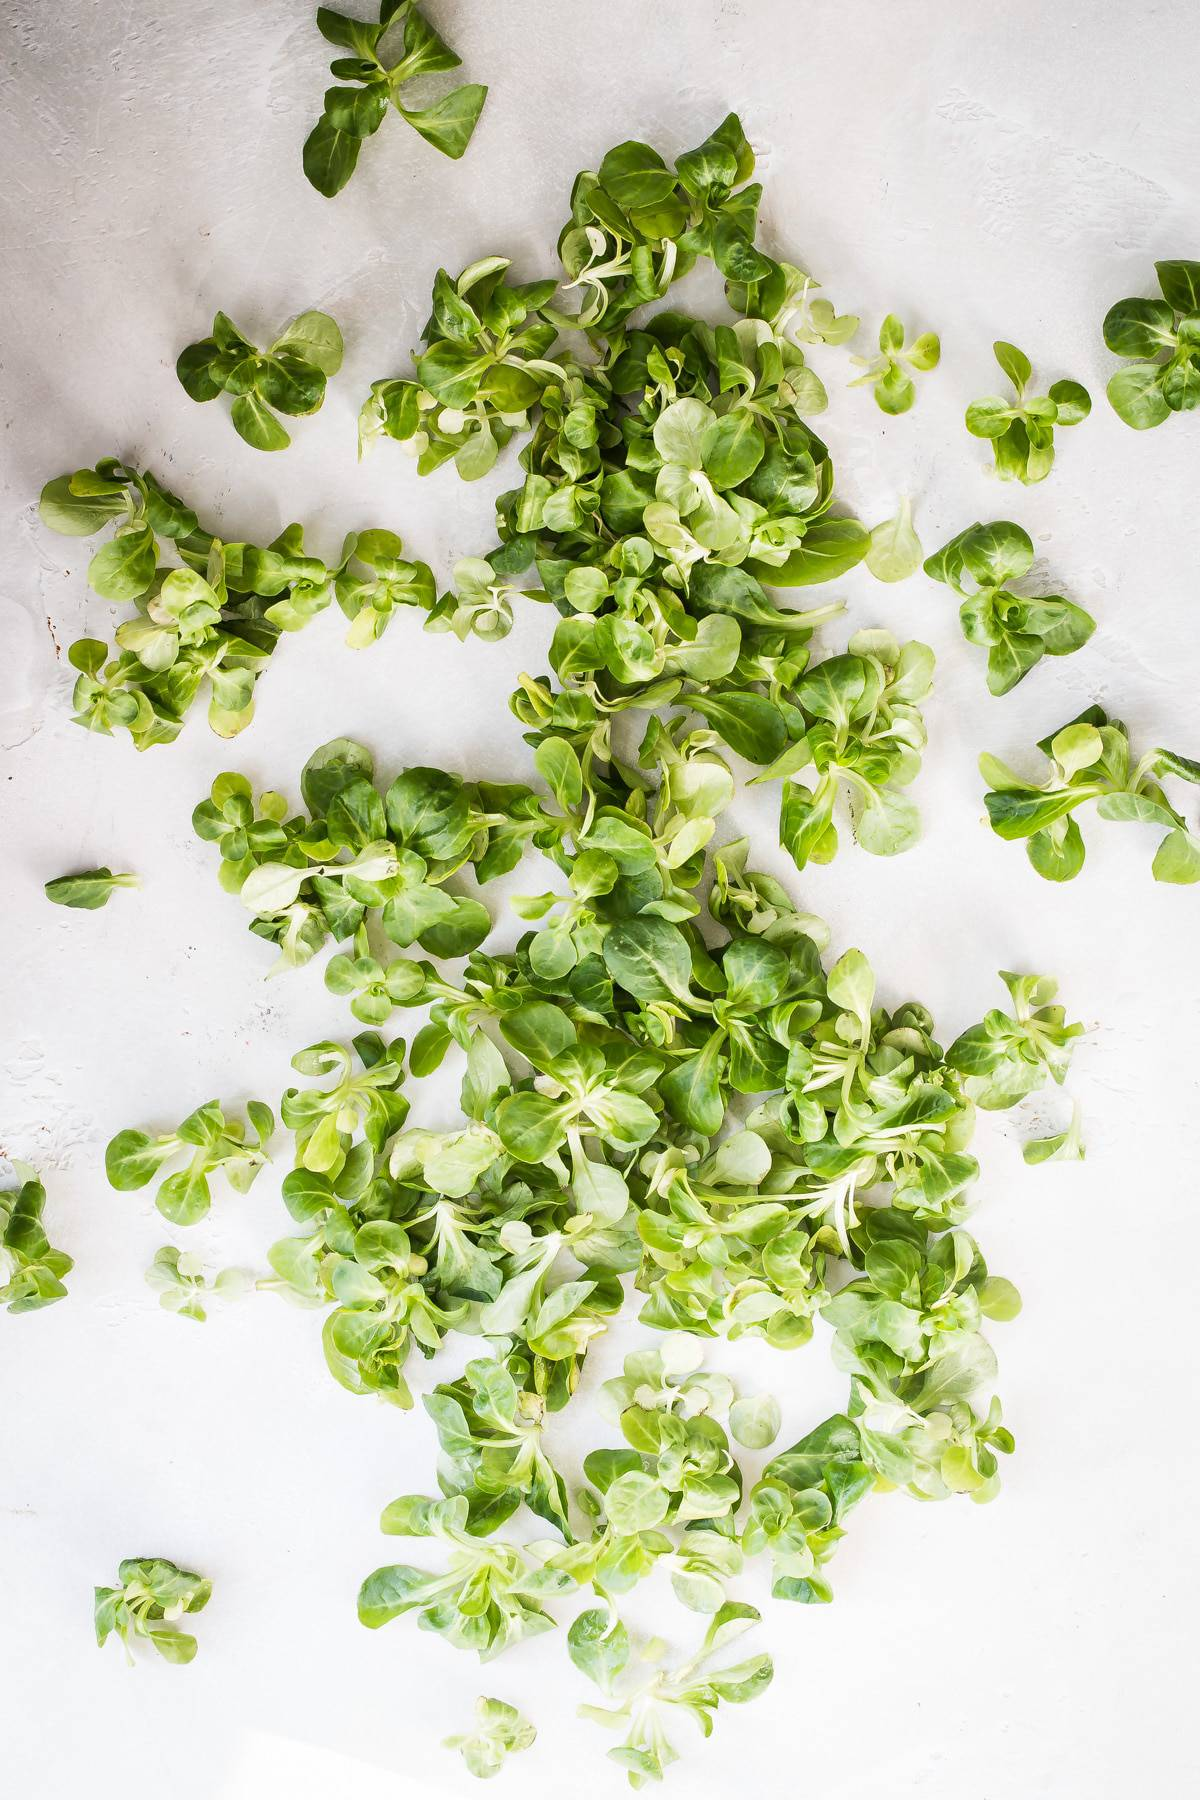 Mache salad greens